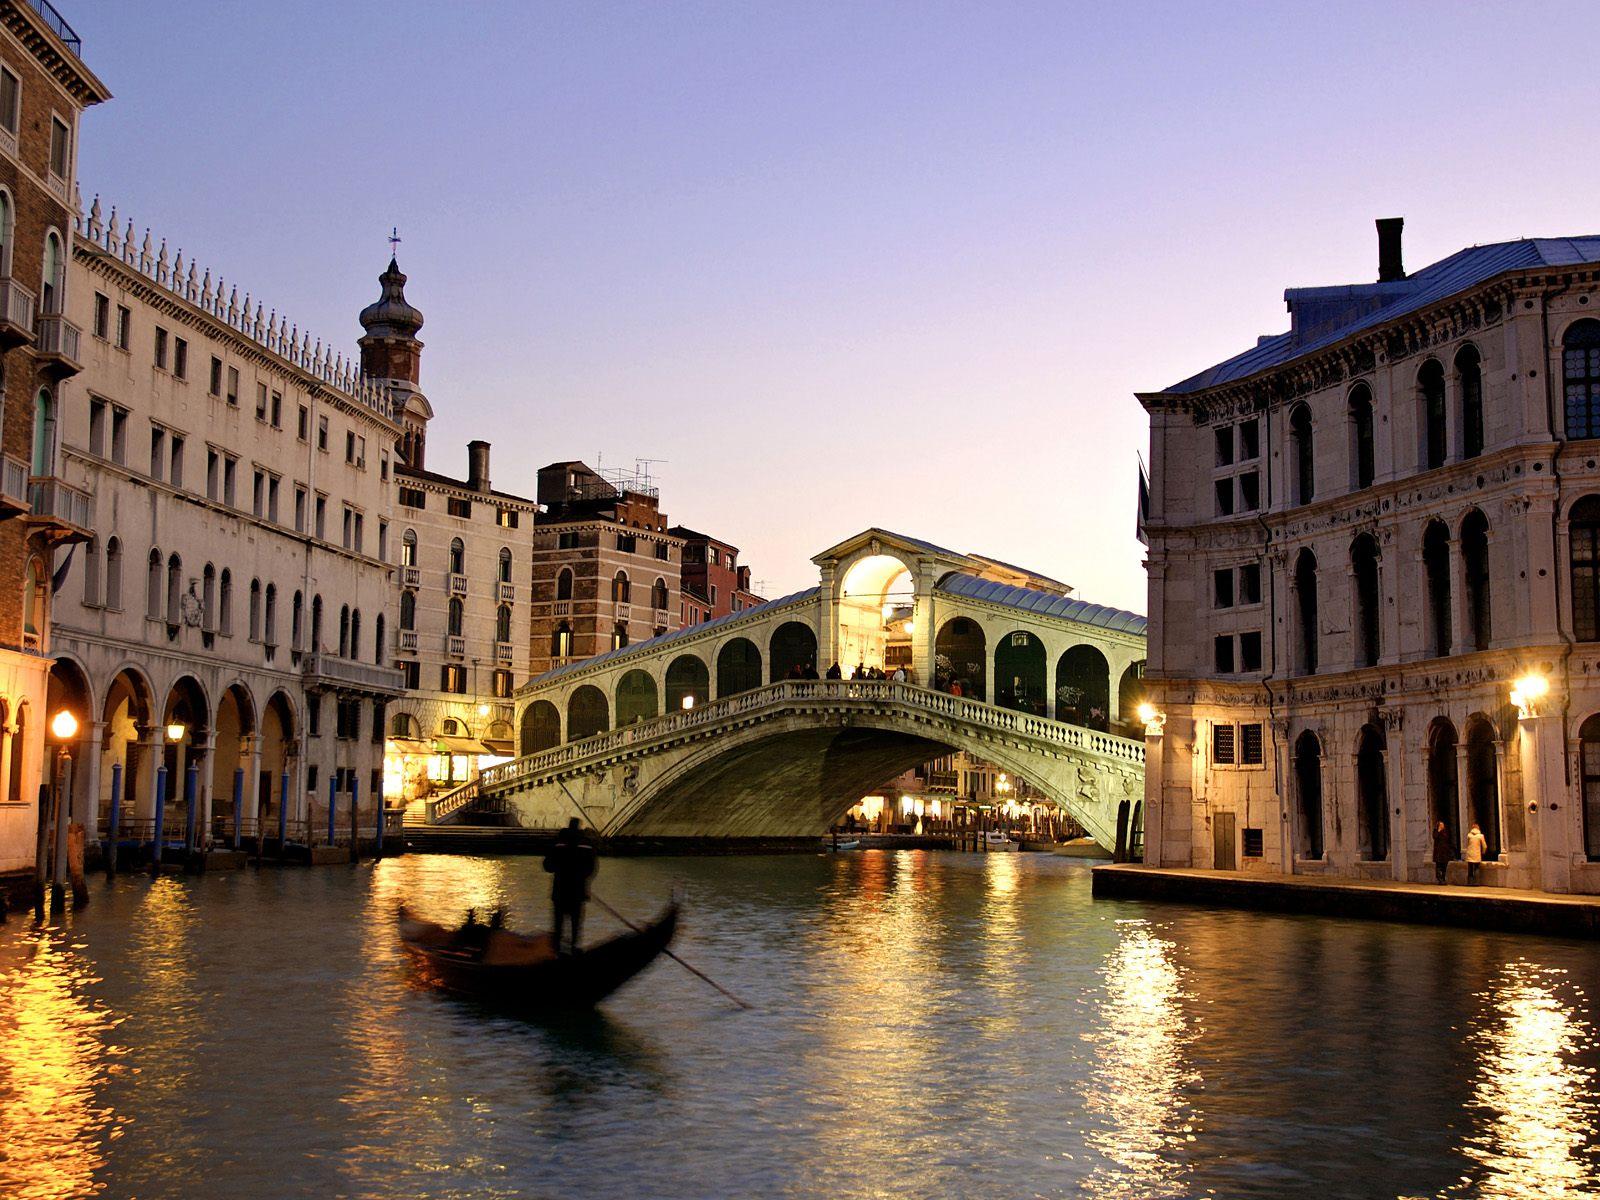 Rialto Bridge Grand Canal Italy wallpaper